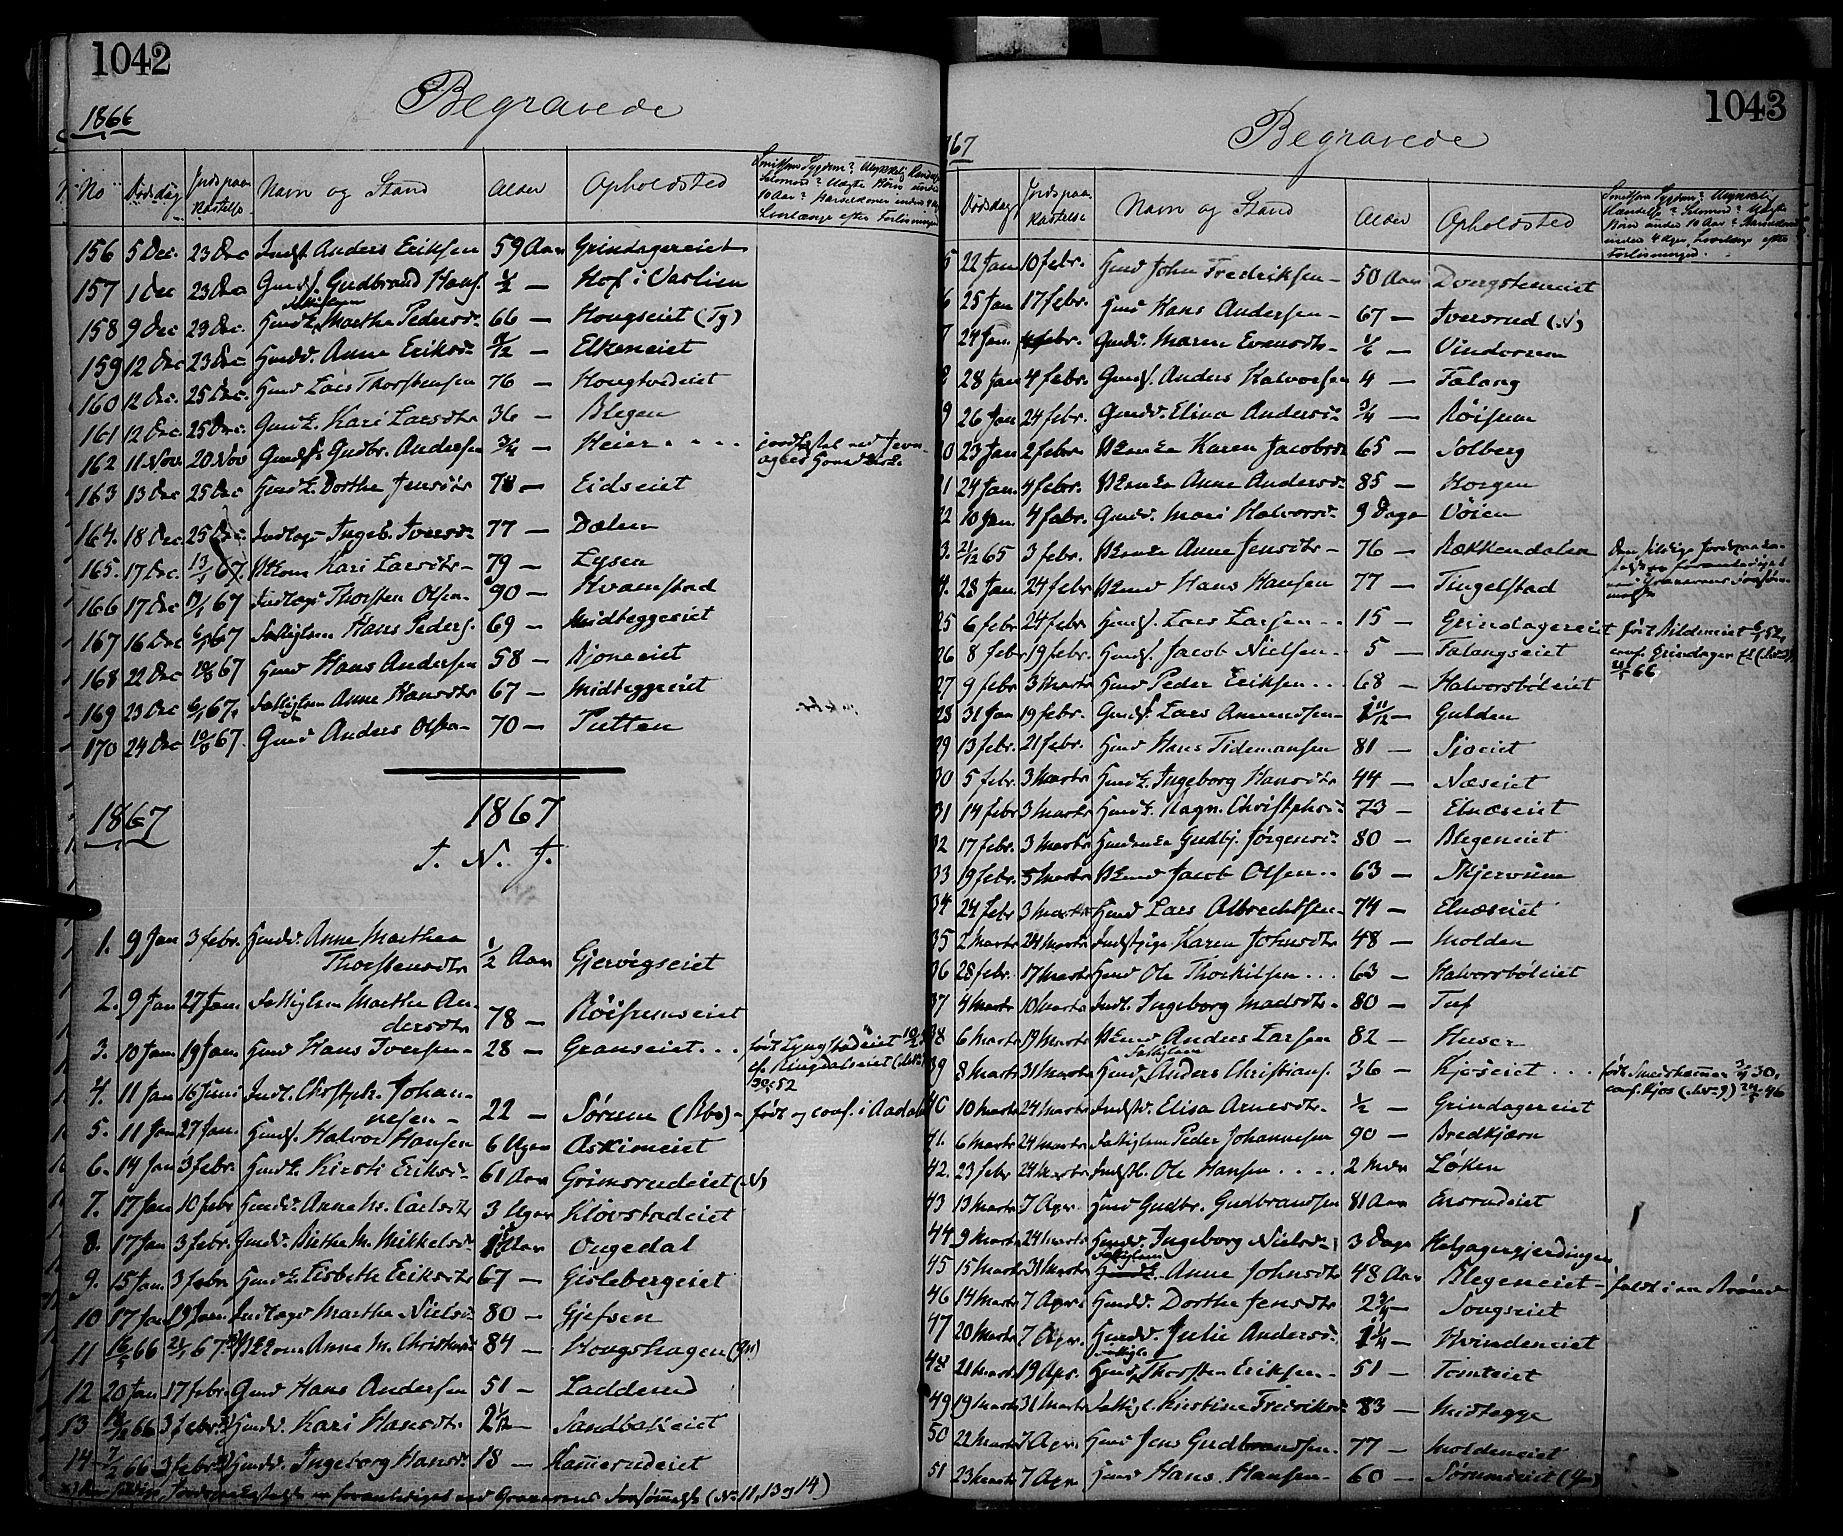 SAH, Gran prestekontor, Ministerialbok nr. 12, 1856-1874, s. 1042-1043